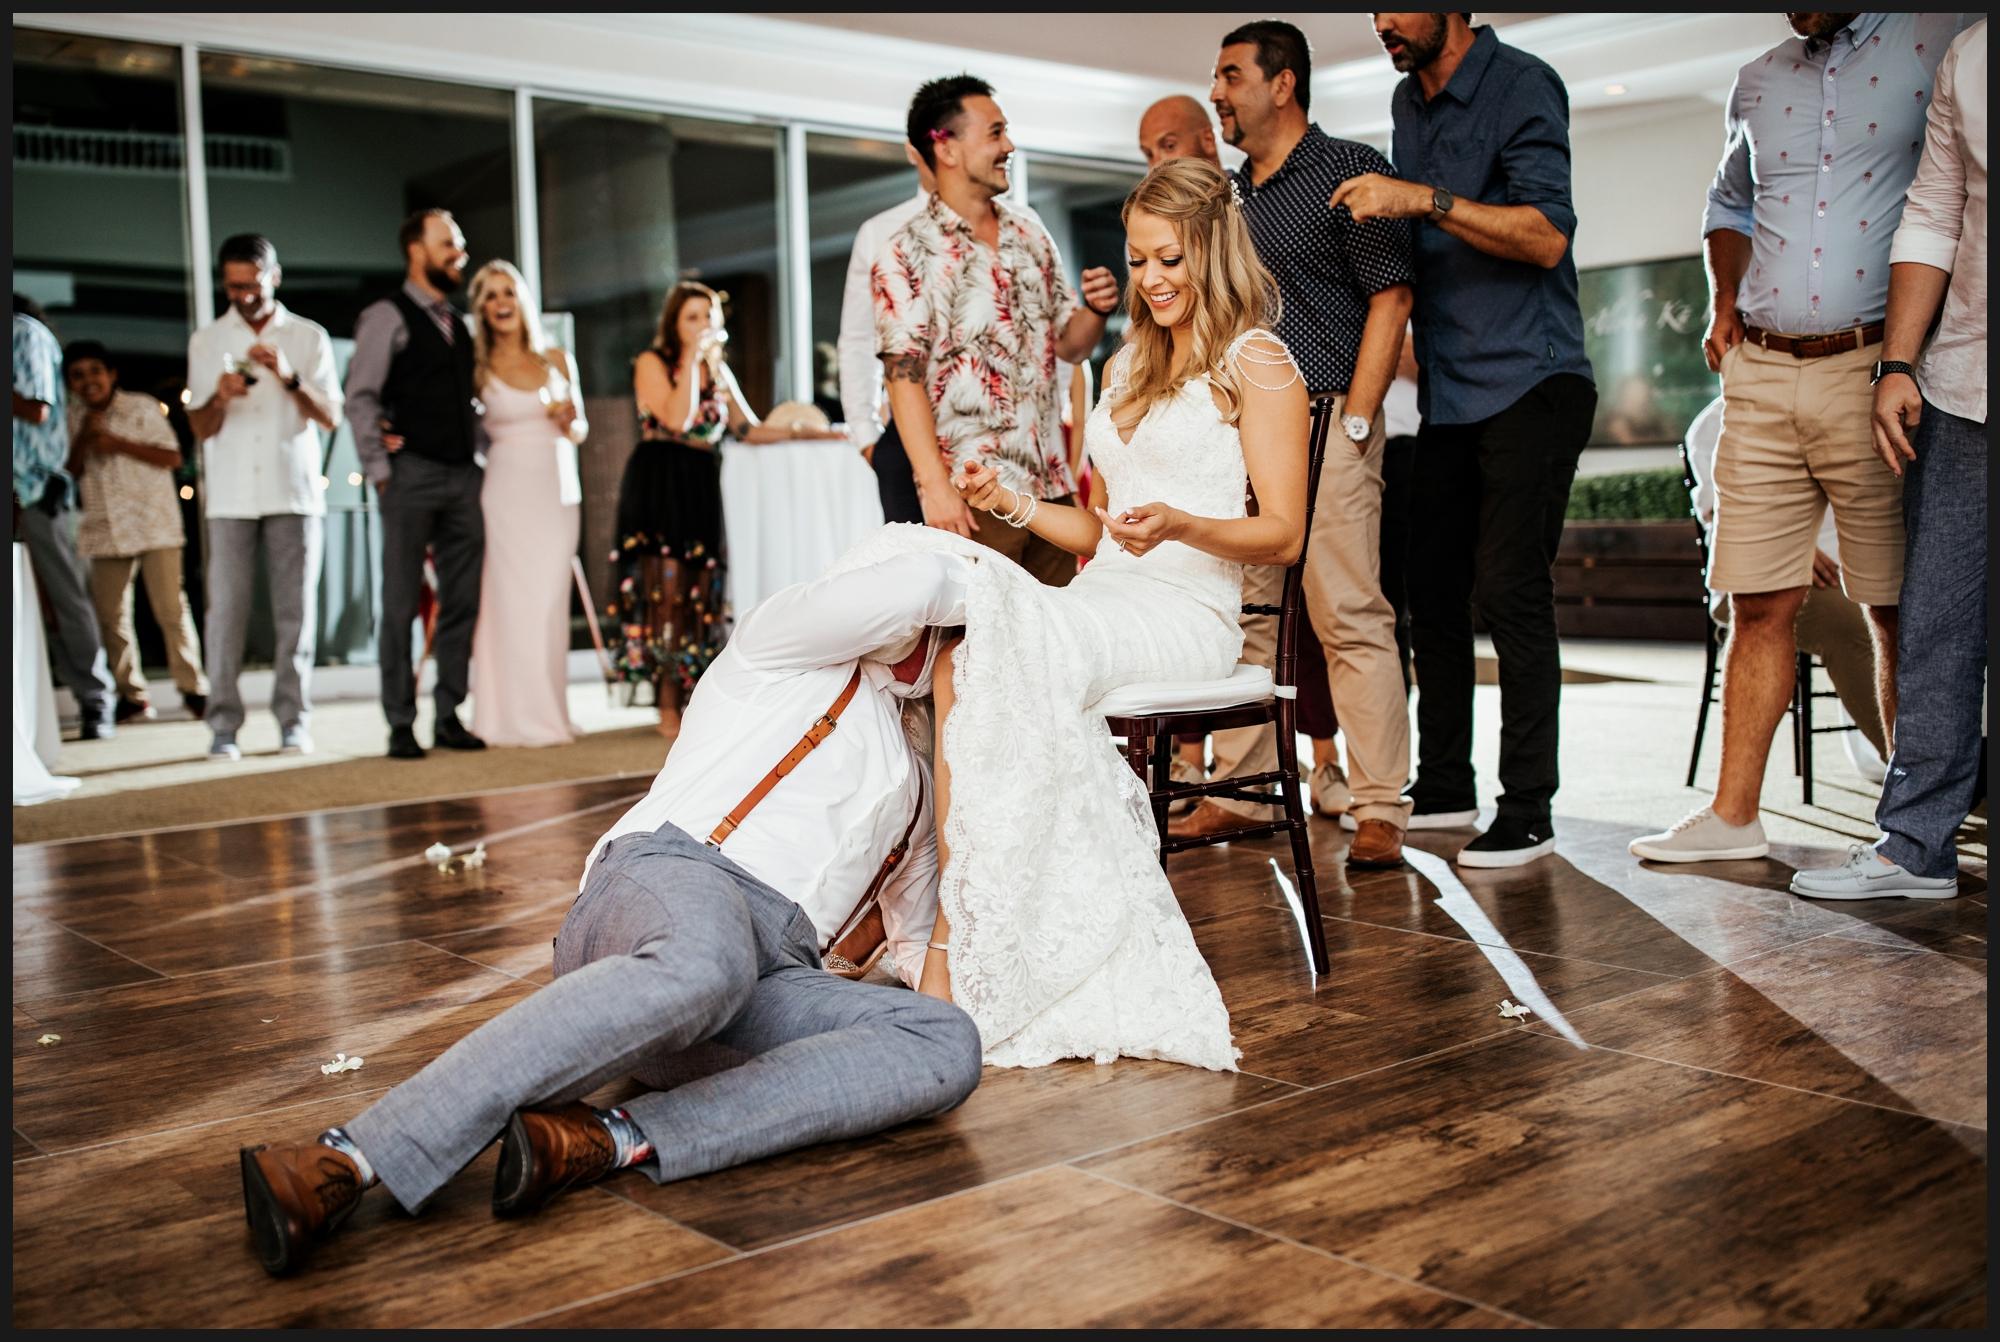 Orlando-Wedding-Photographer-destination-wedding-photographer-florida-wedding-photographer-hawaii-wedding-photographer_0098.jpg